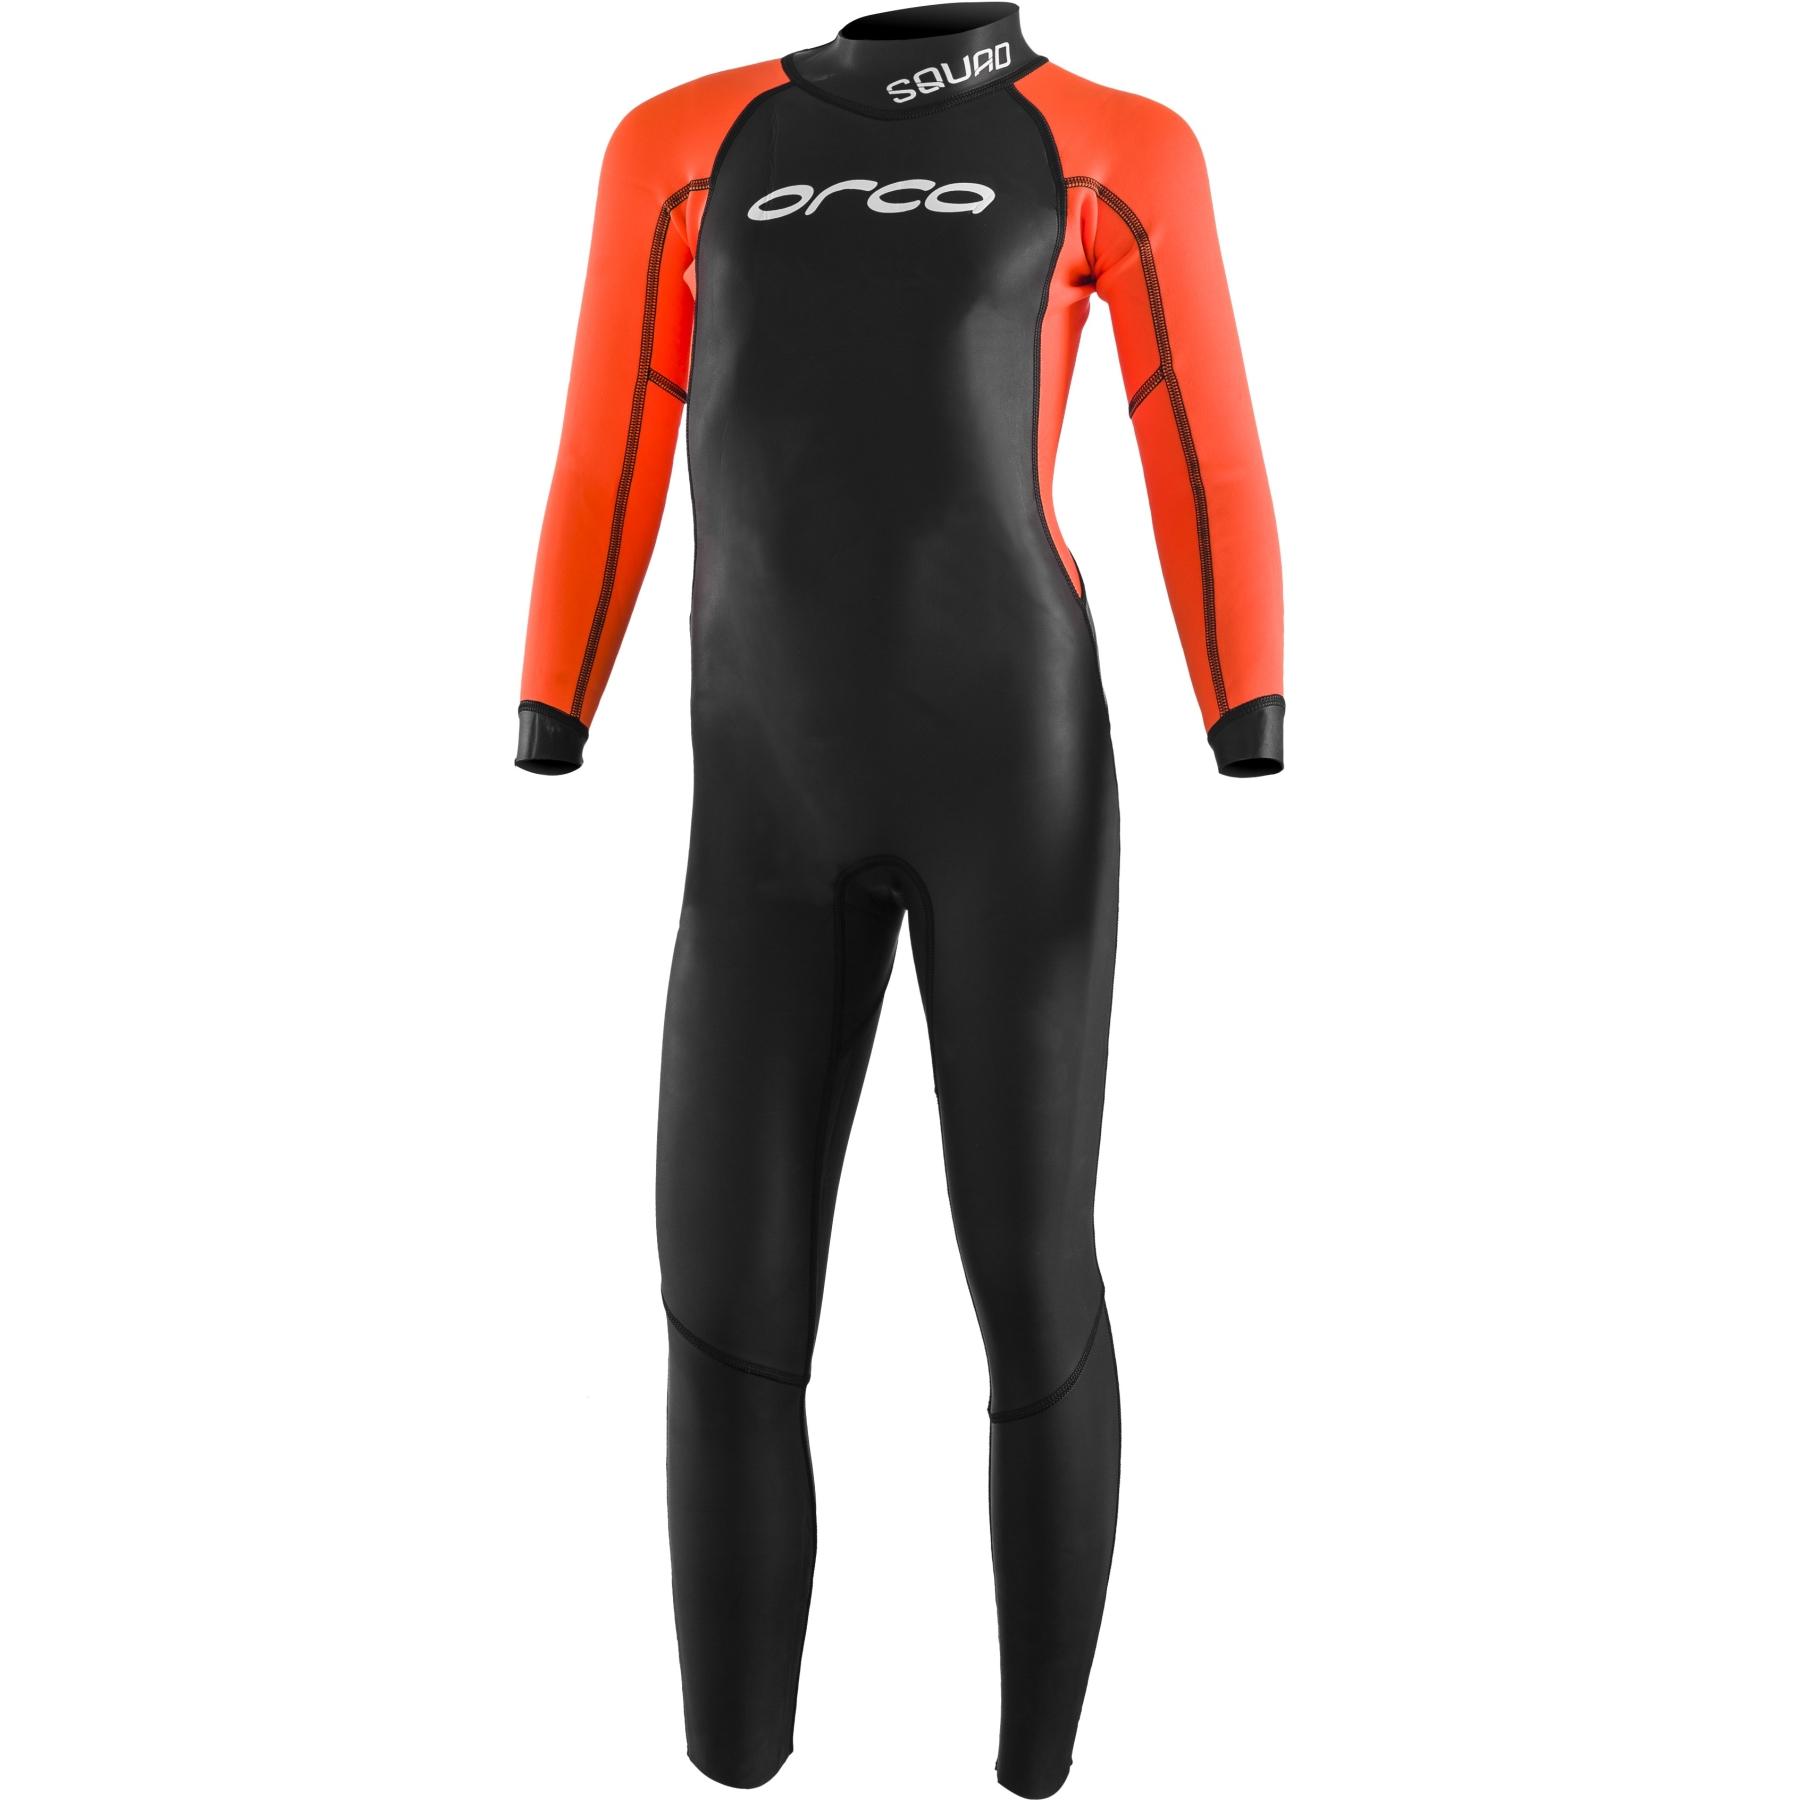 Orca Triathlon Openwater Squad Kinder Neoprenanzug - black